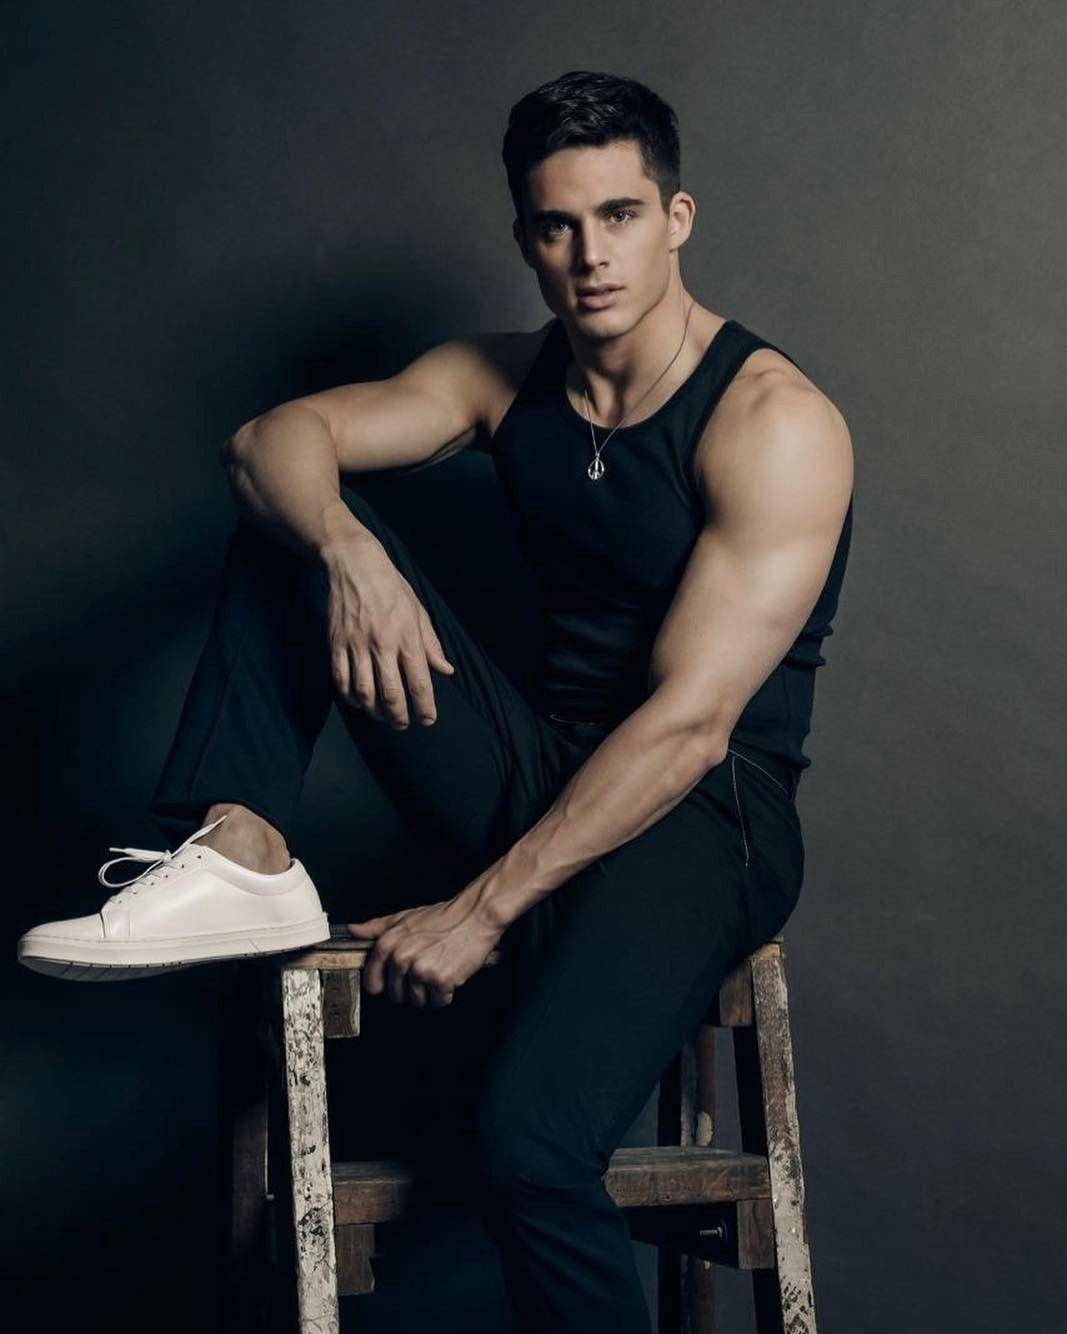 твиттере фото моделей мужчин гимнастов самом деле